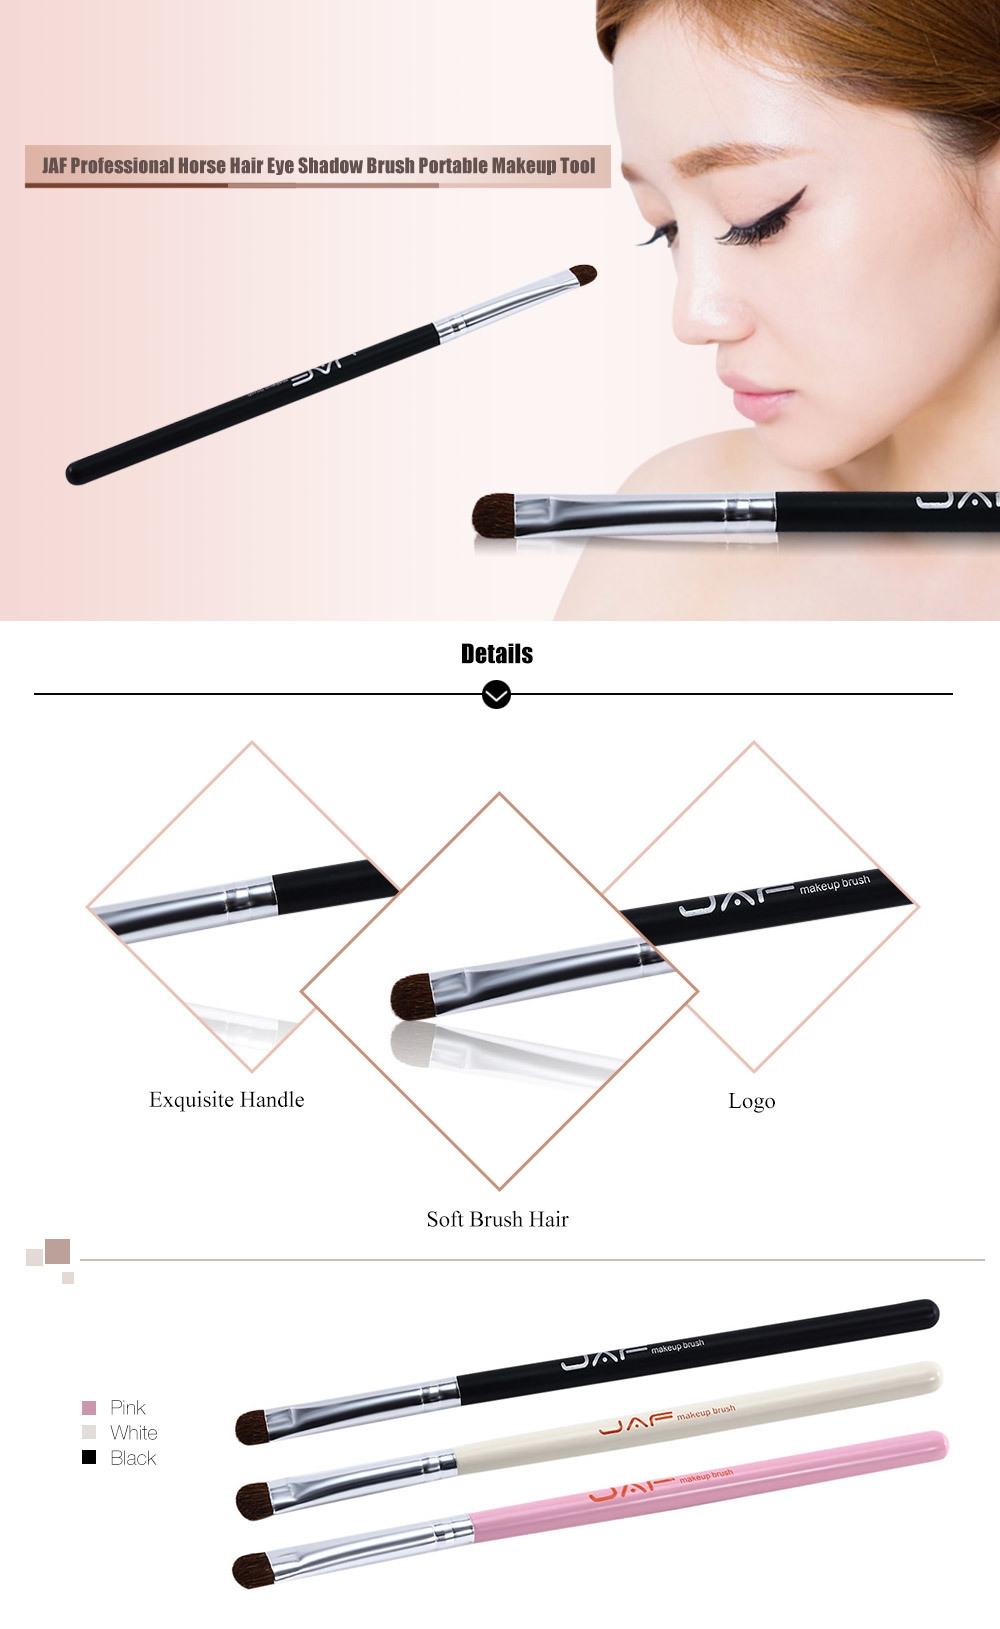 JAF Professional Horse Hair Eye Shadow Brush Portable Makeup Tool